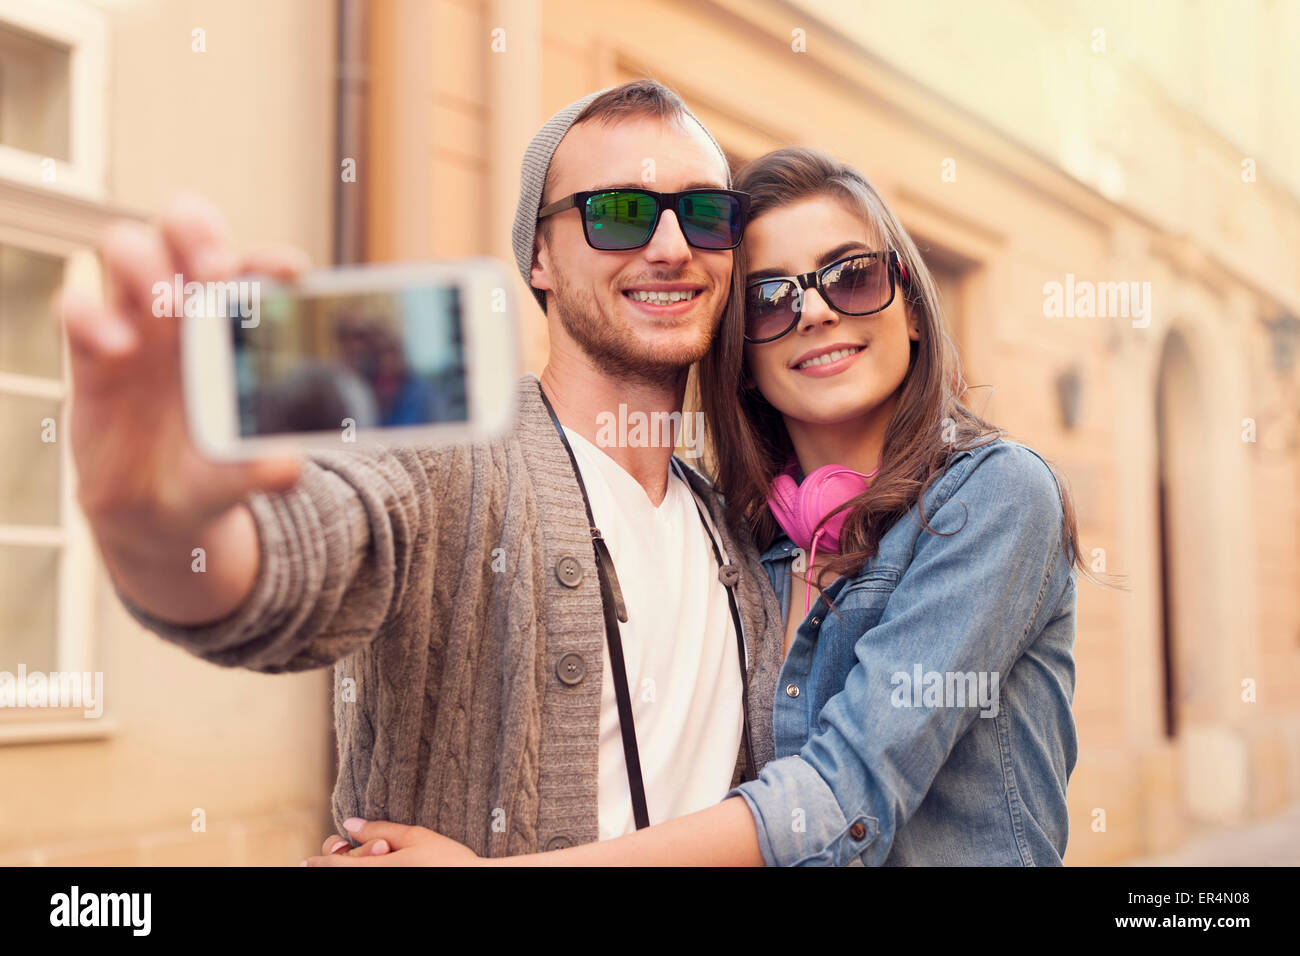 Fashionable couple taking selfie by mobile phone. Krakow, Poland Stock Photo